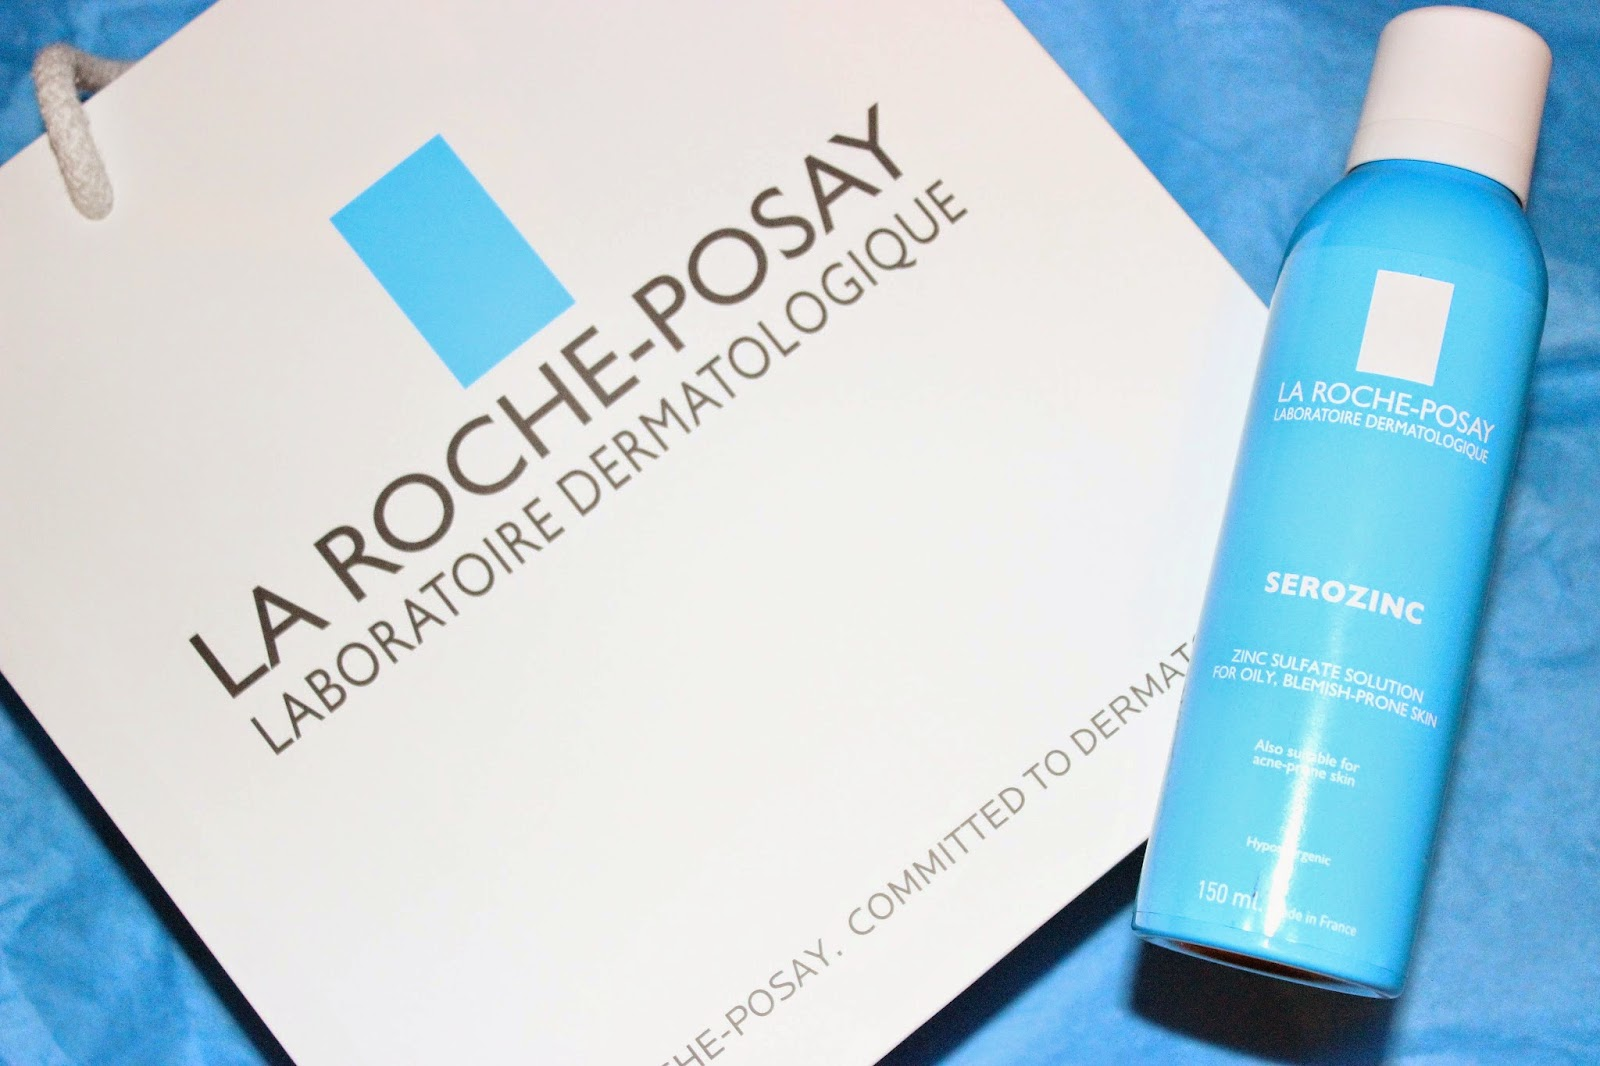 La Roche-Posey Serozinc Toner Review